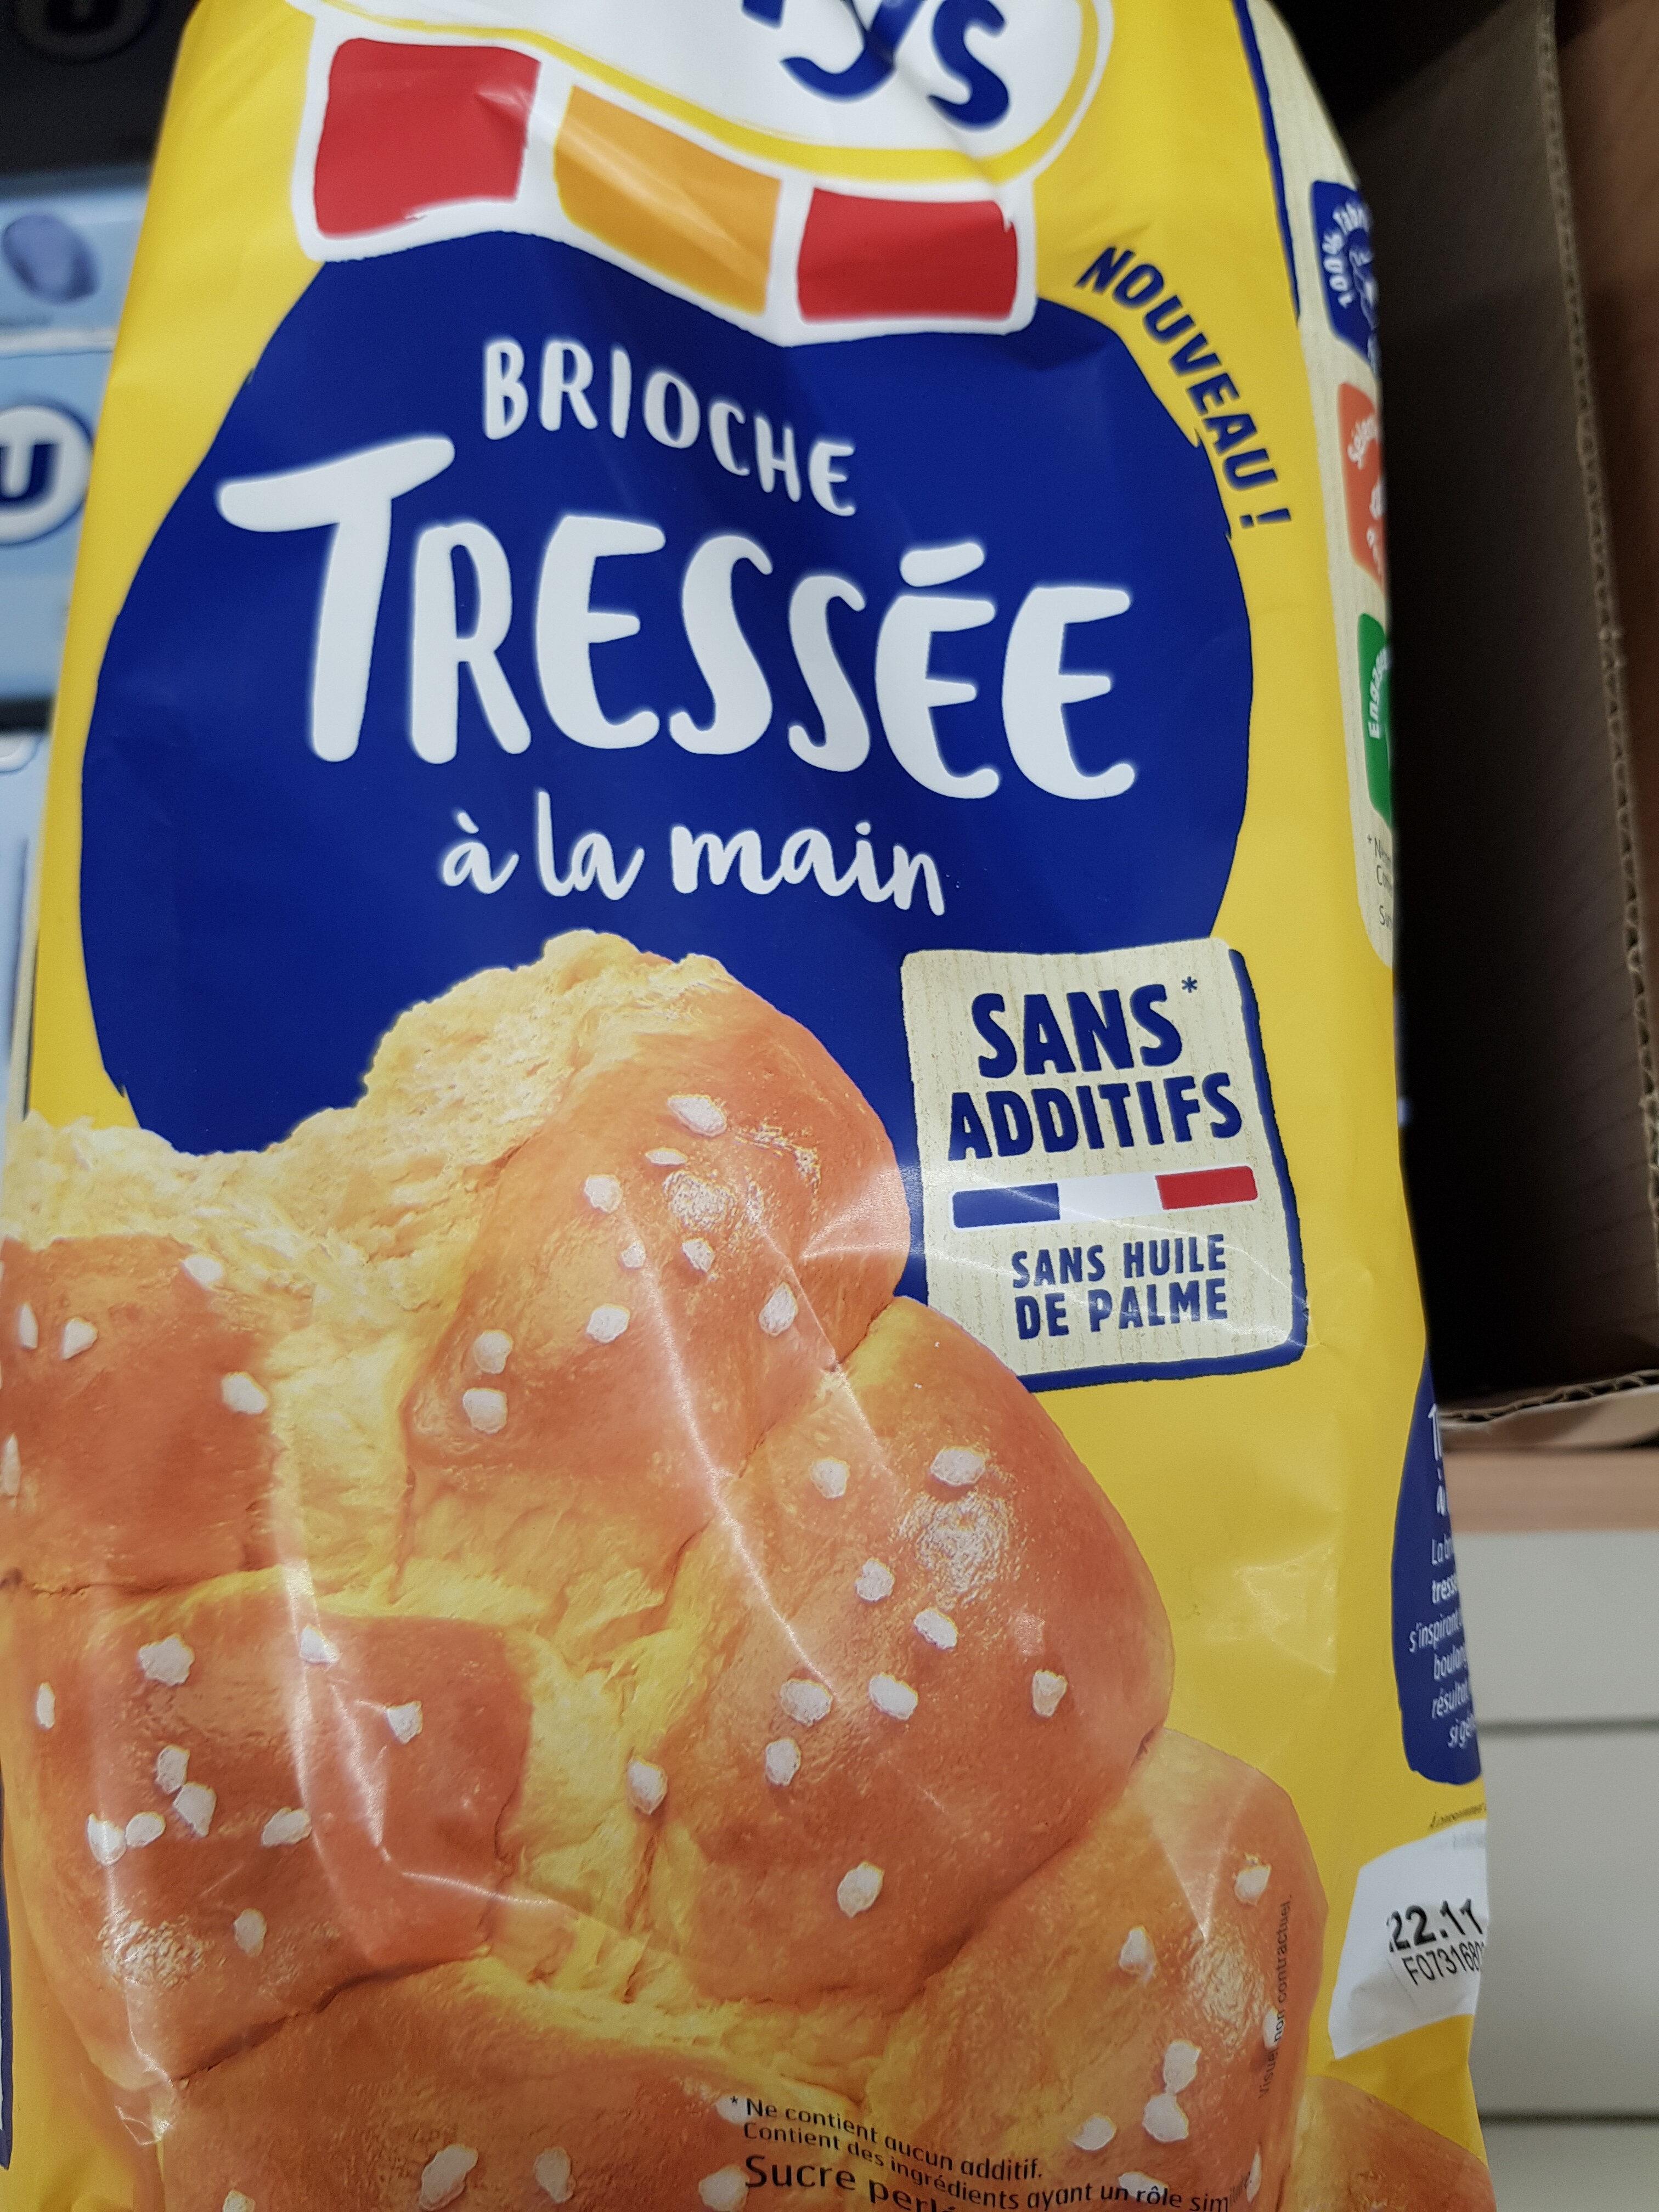 Brioche tressée nature ss additifs - Product - fr